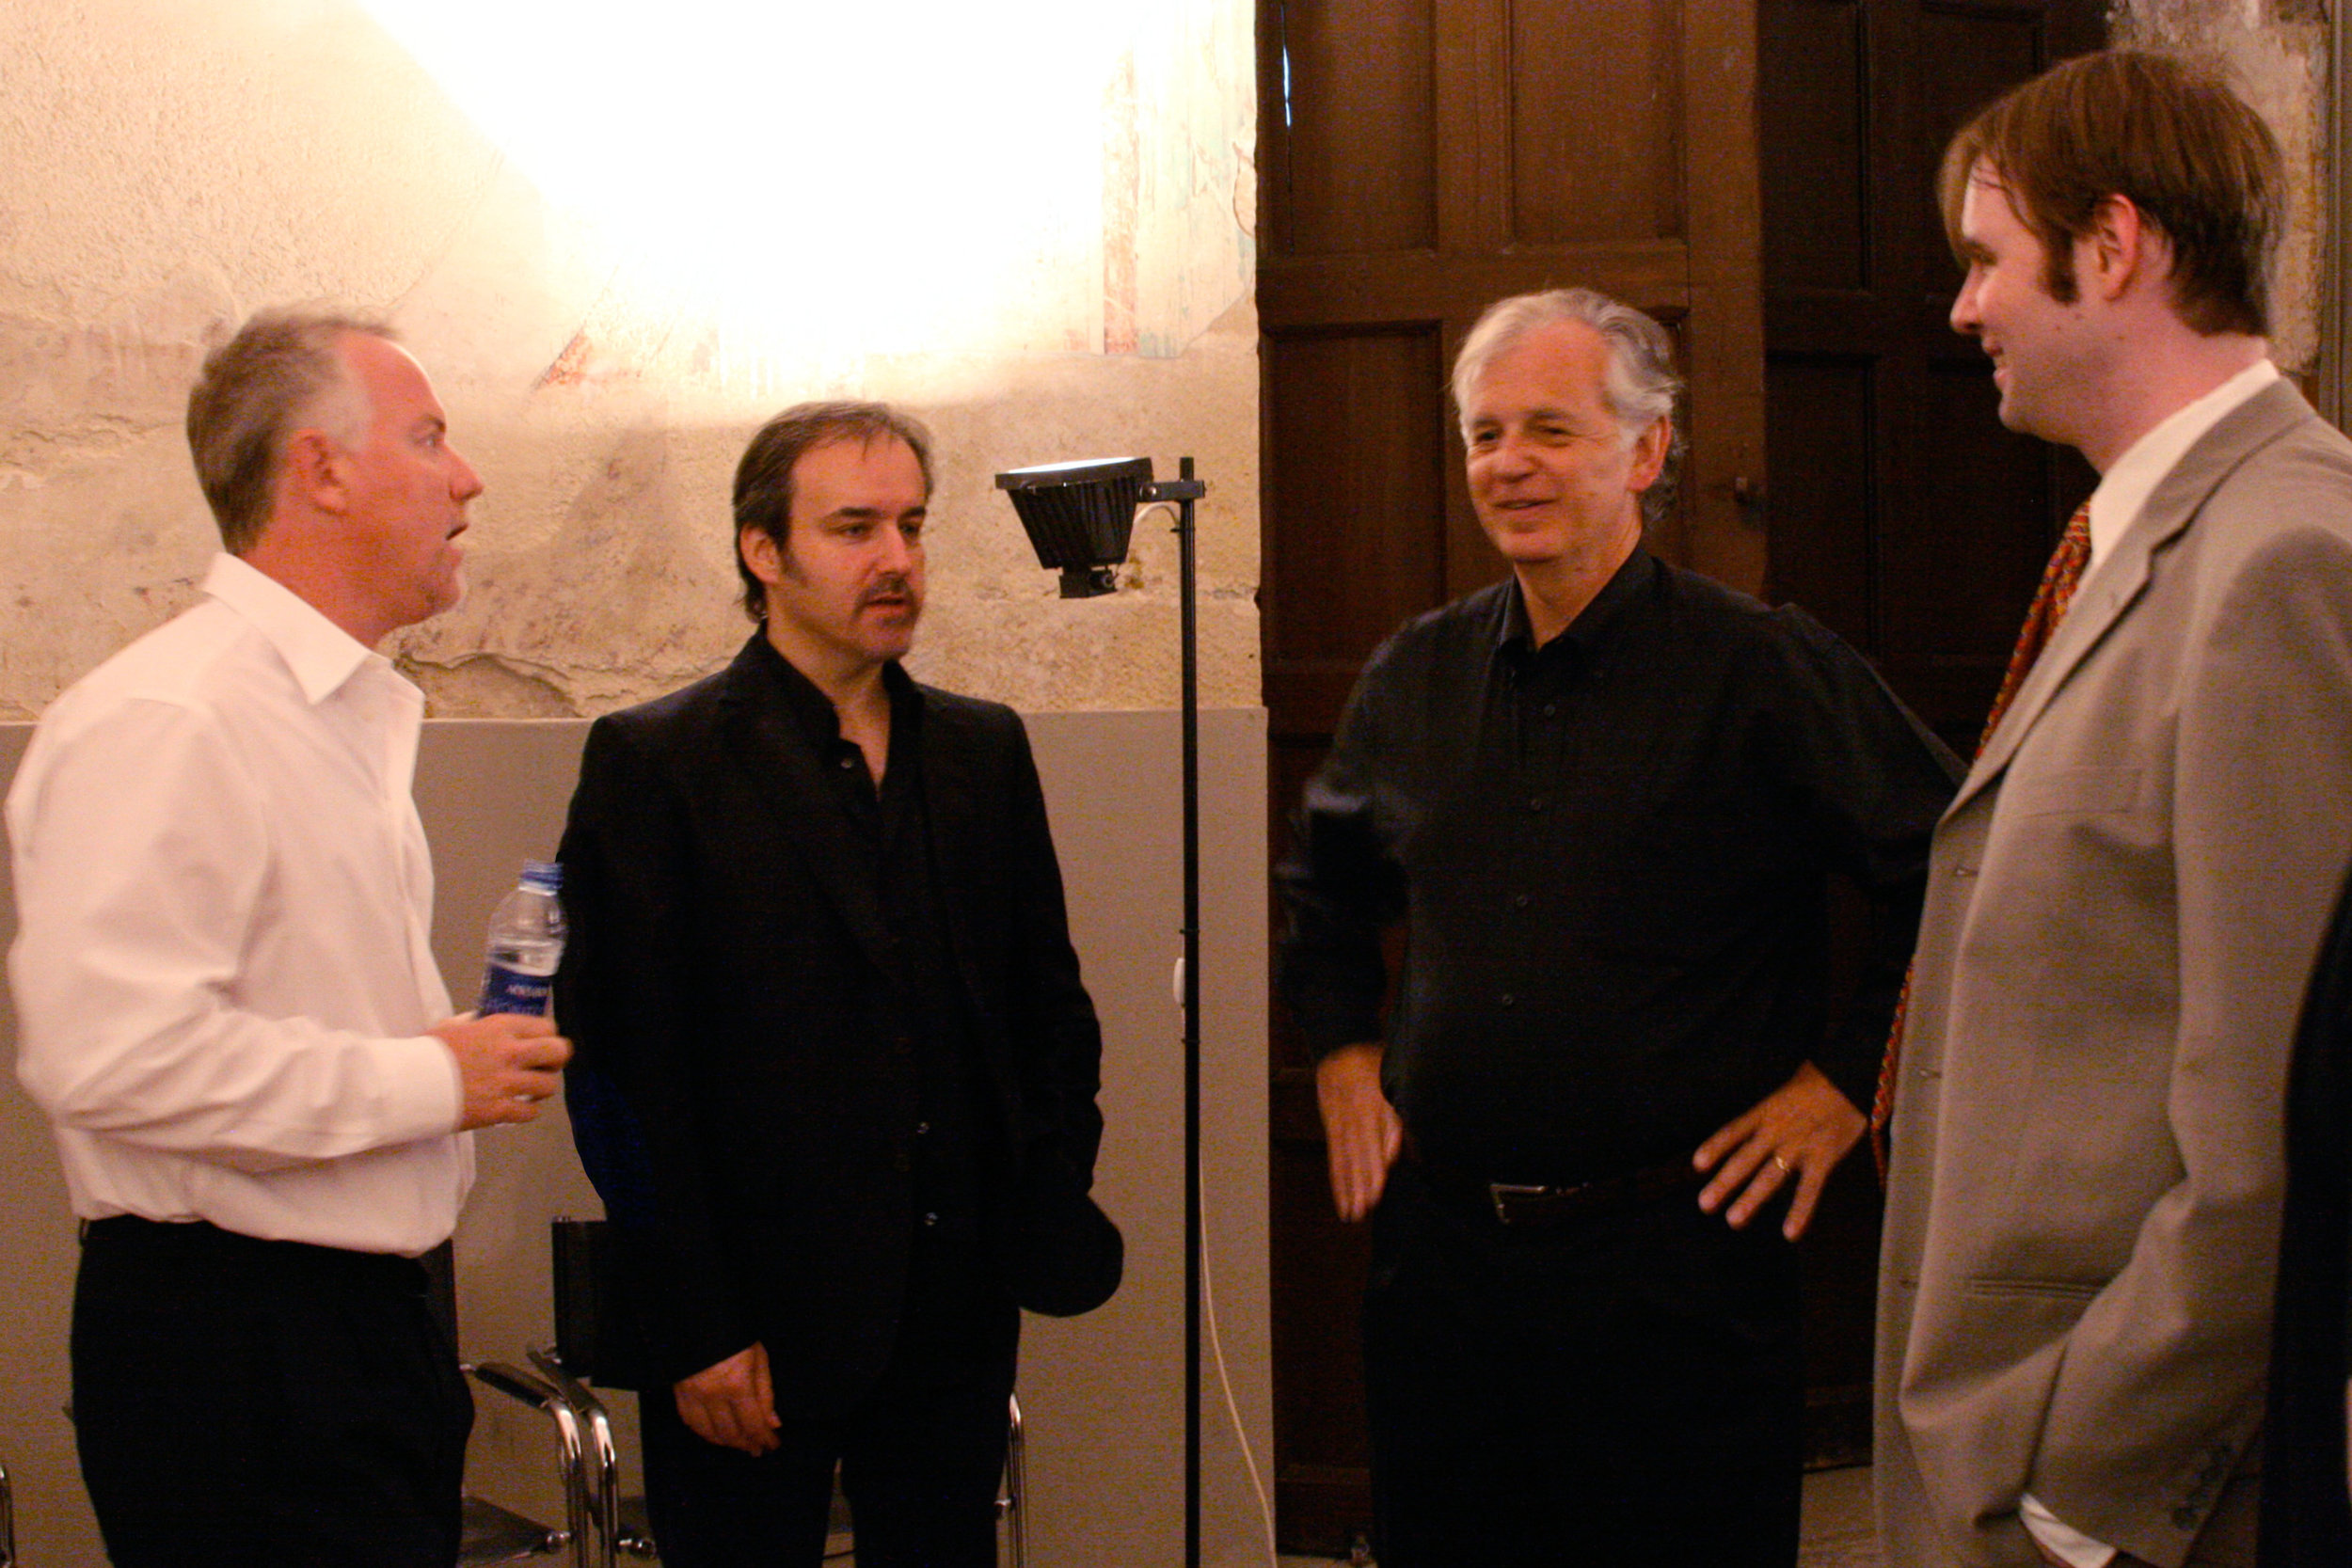 Composers John Debney, David Arnold, Bruce Broughton, & Kaska